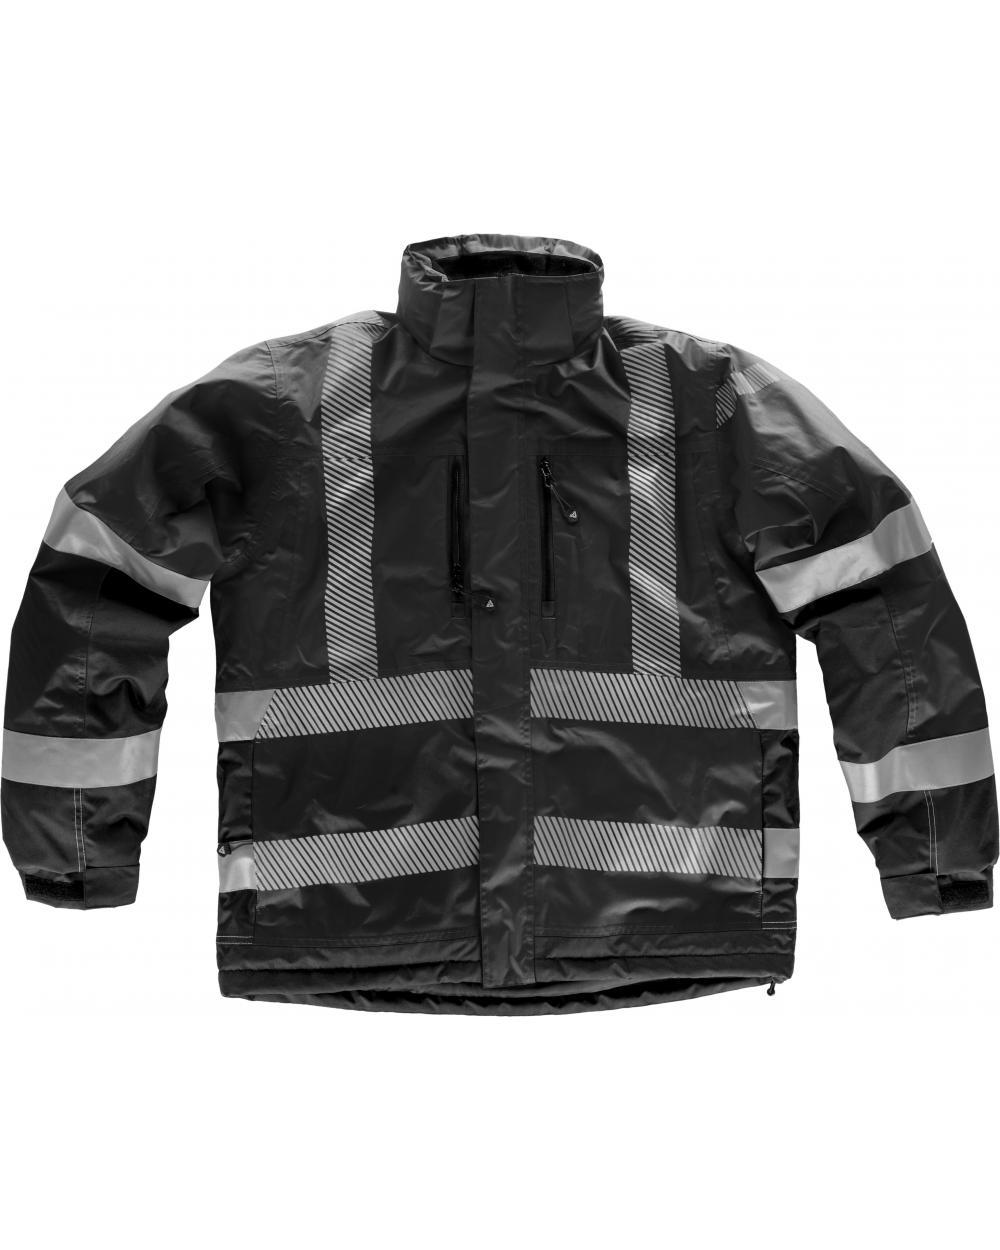 Comprar Parka impermeable con capucha S9263 Negro workteam delante